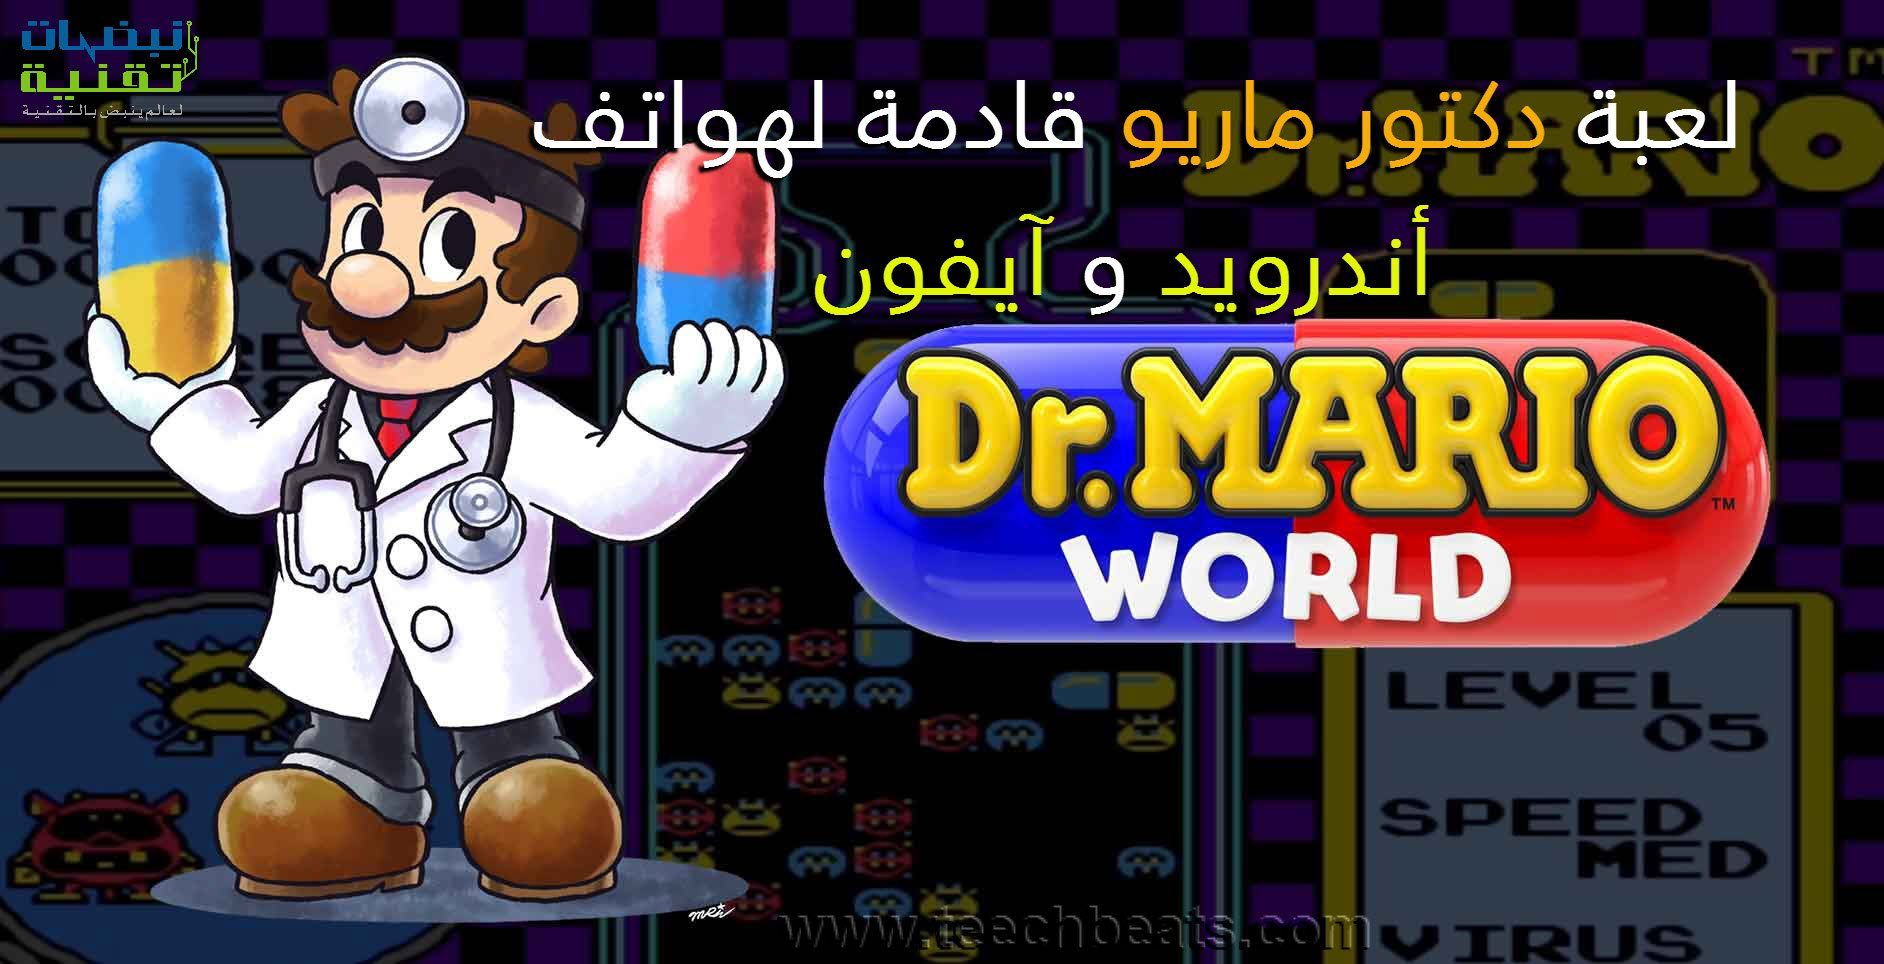 لعبة Dr. Mario